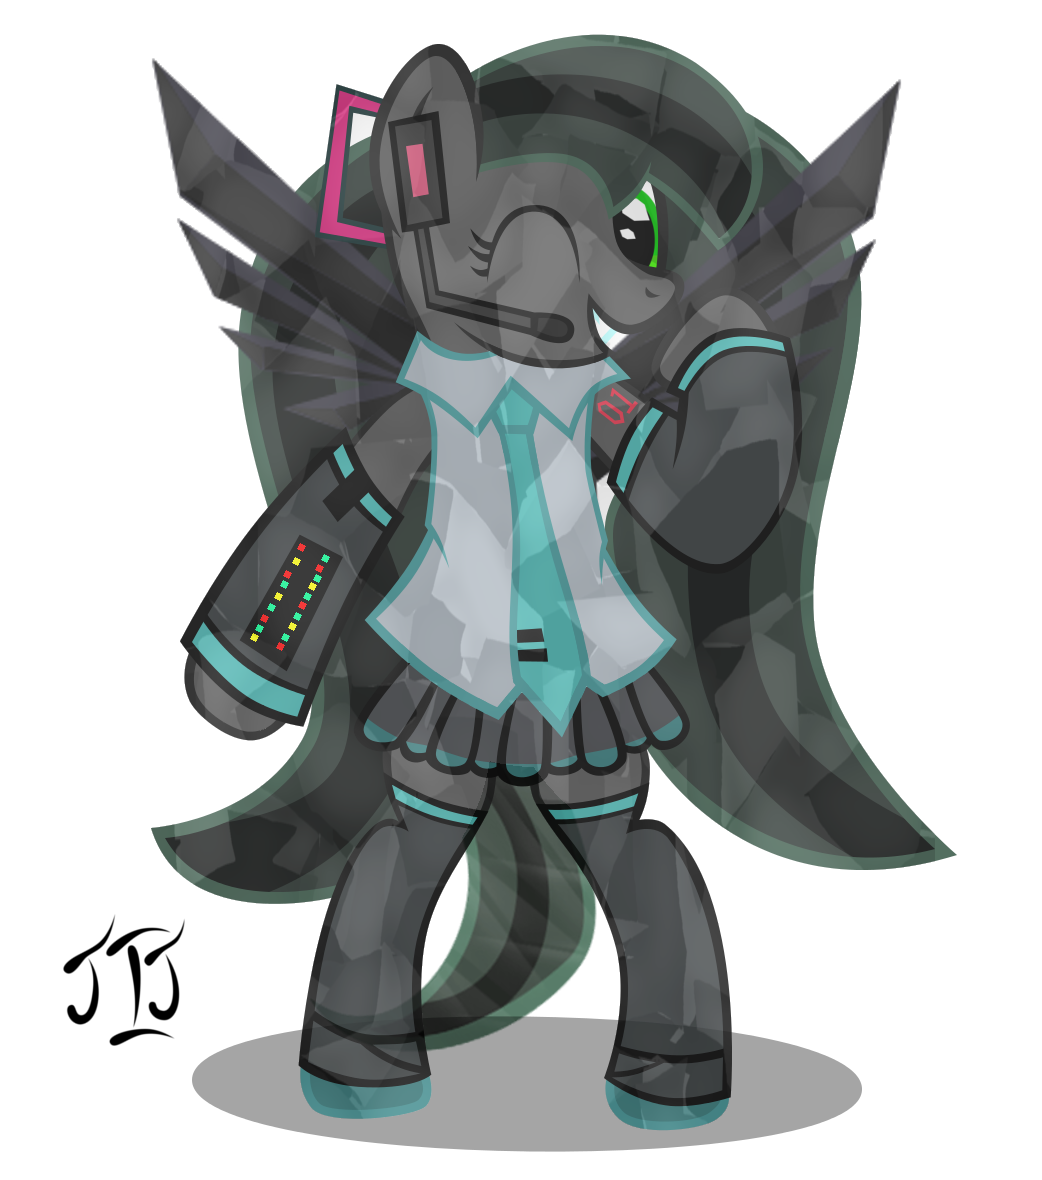 Hatsune Obsidiku (Mlp style) Vocaloid by Midnight-Devilwitch